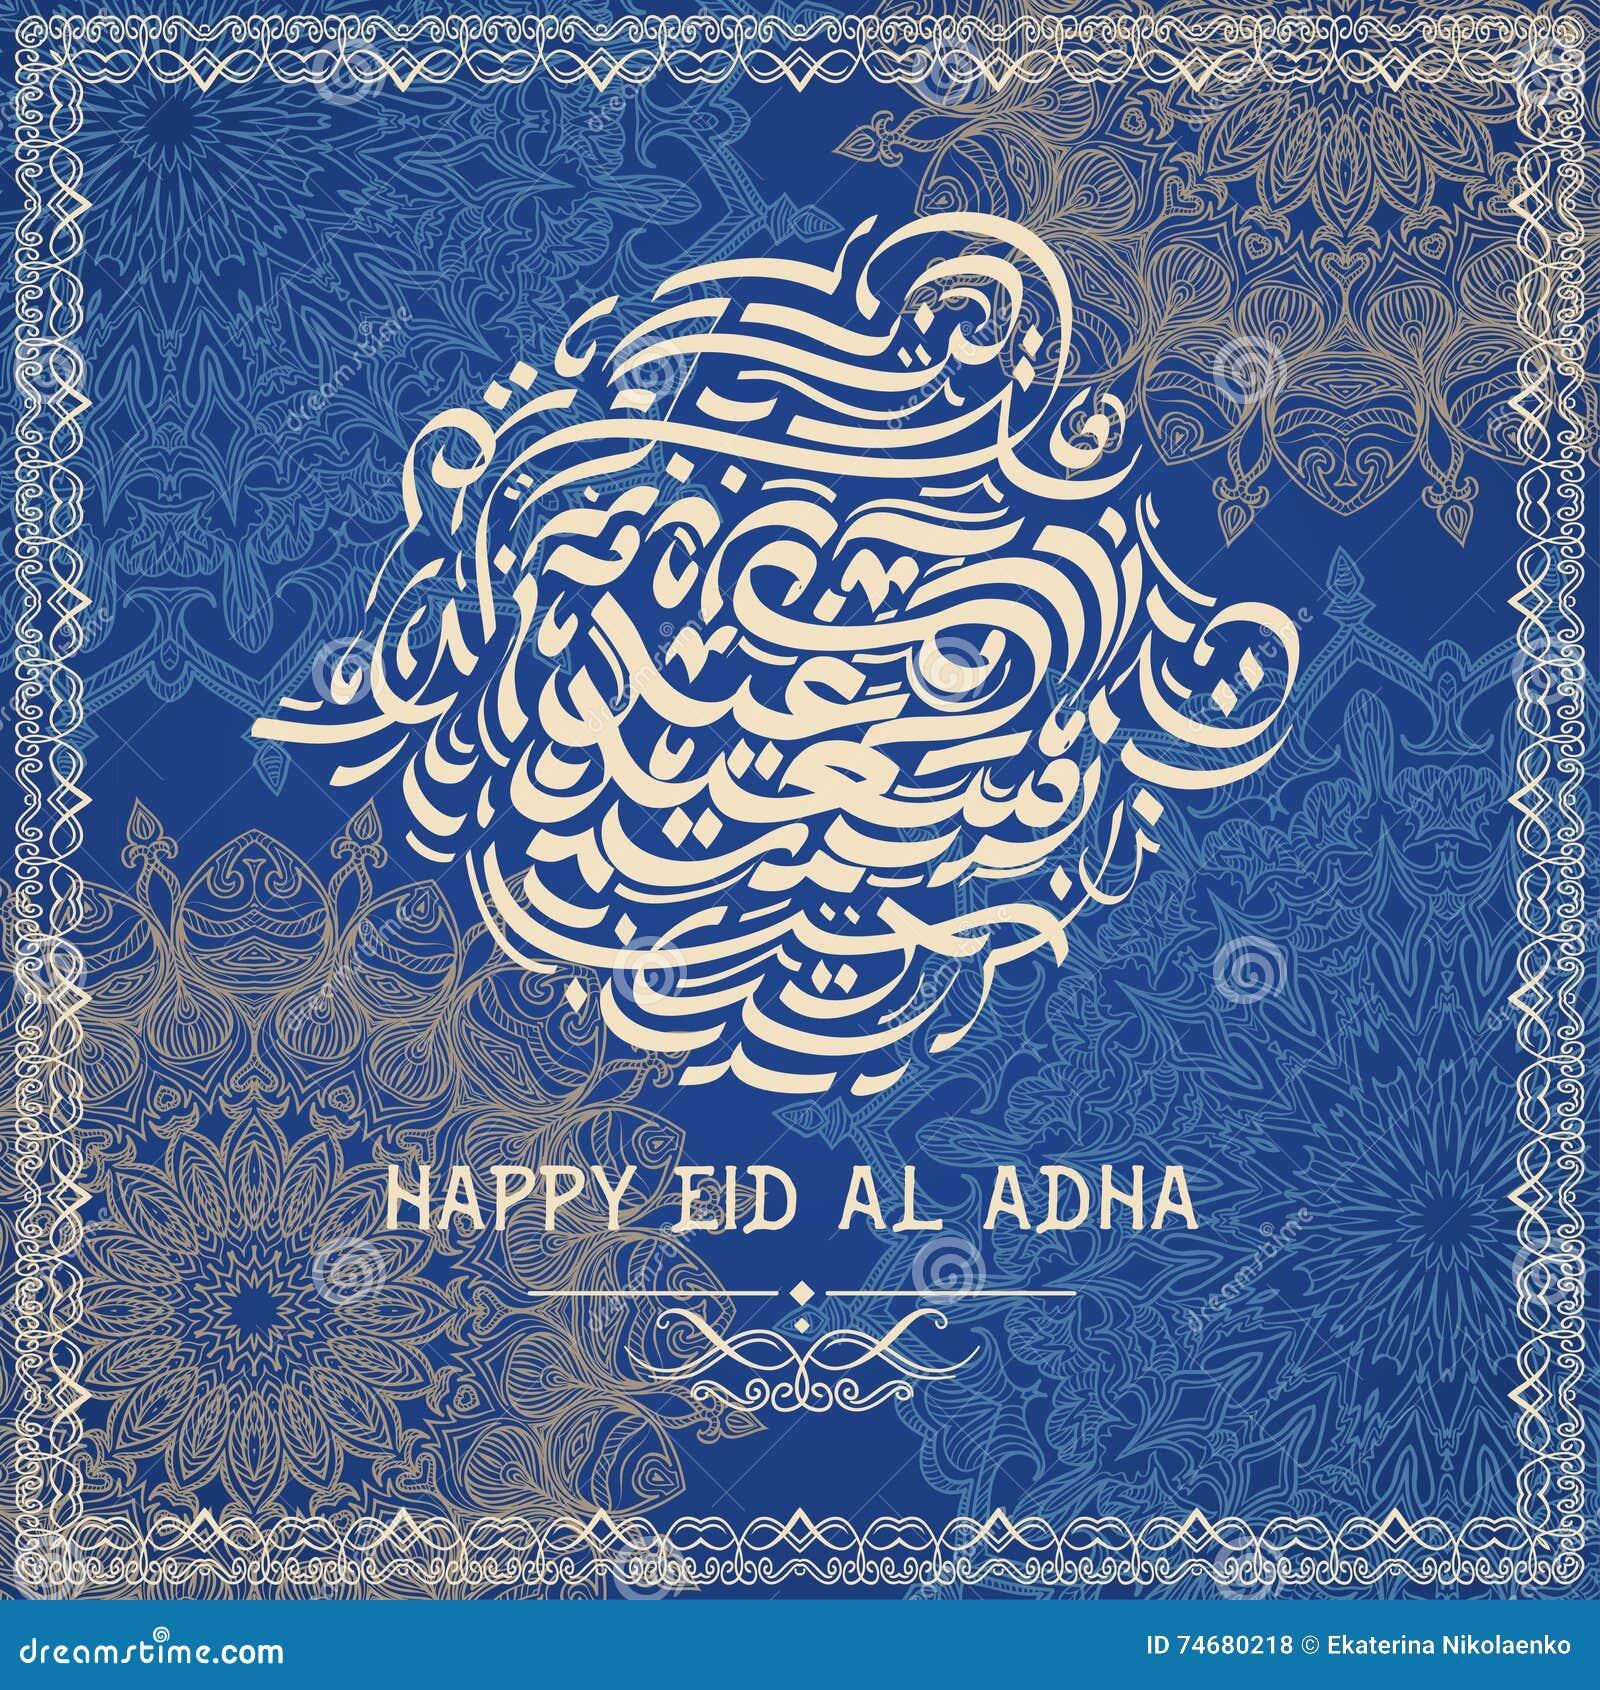 Happy eid al adha arabic islamic calligraphy translated as happy happy eid al adha arabic islamic calligraphy translated as happy eid al adha and ornate mandala concept design greeting card for muslim community m4hsunfo